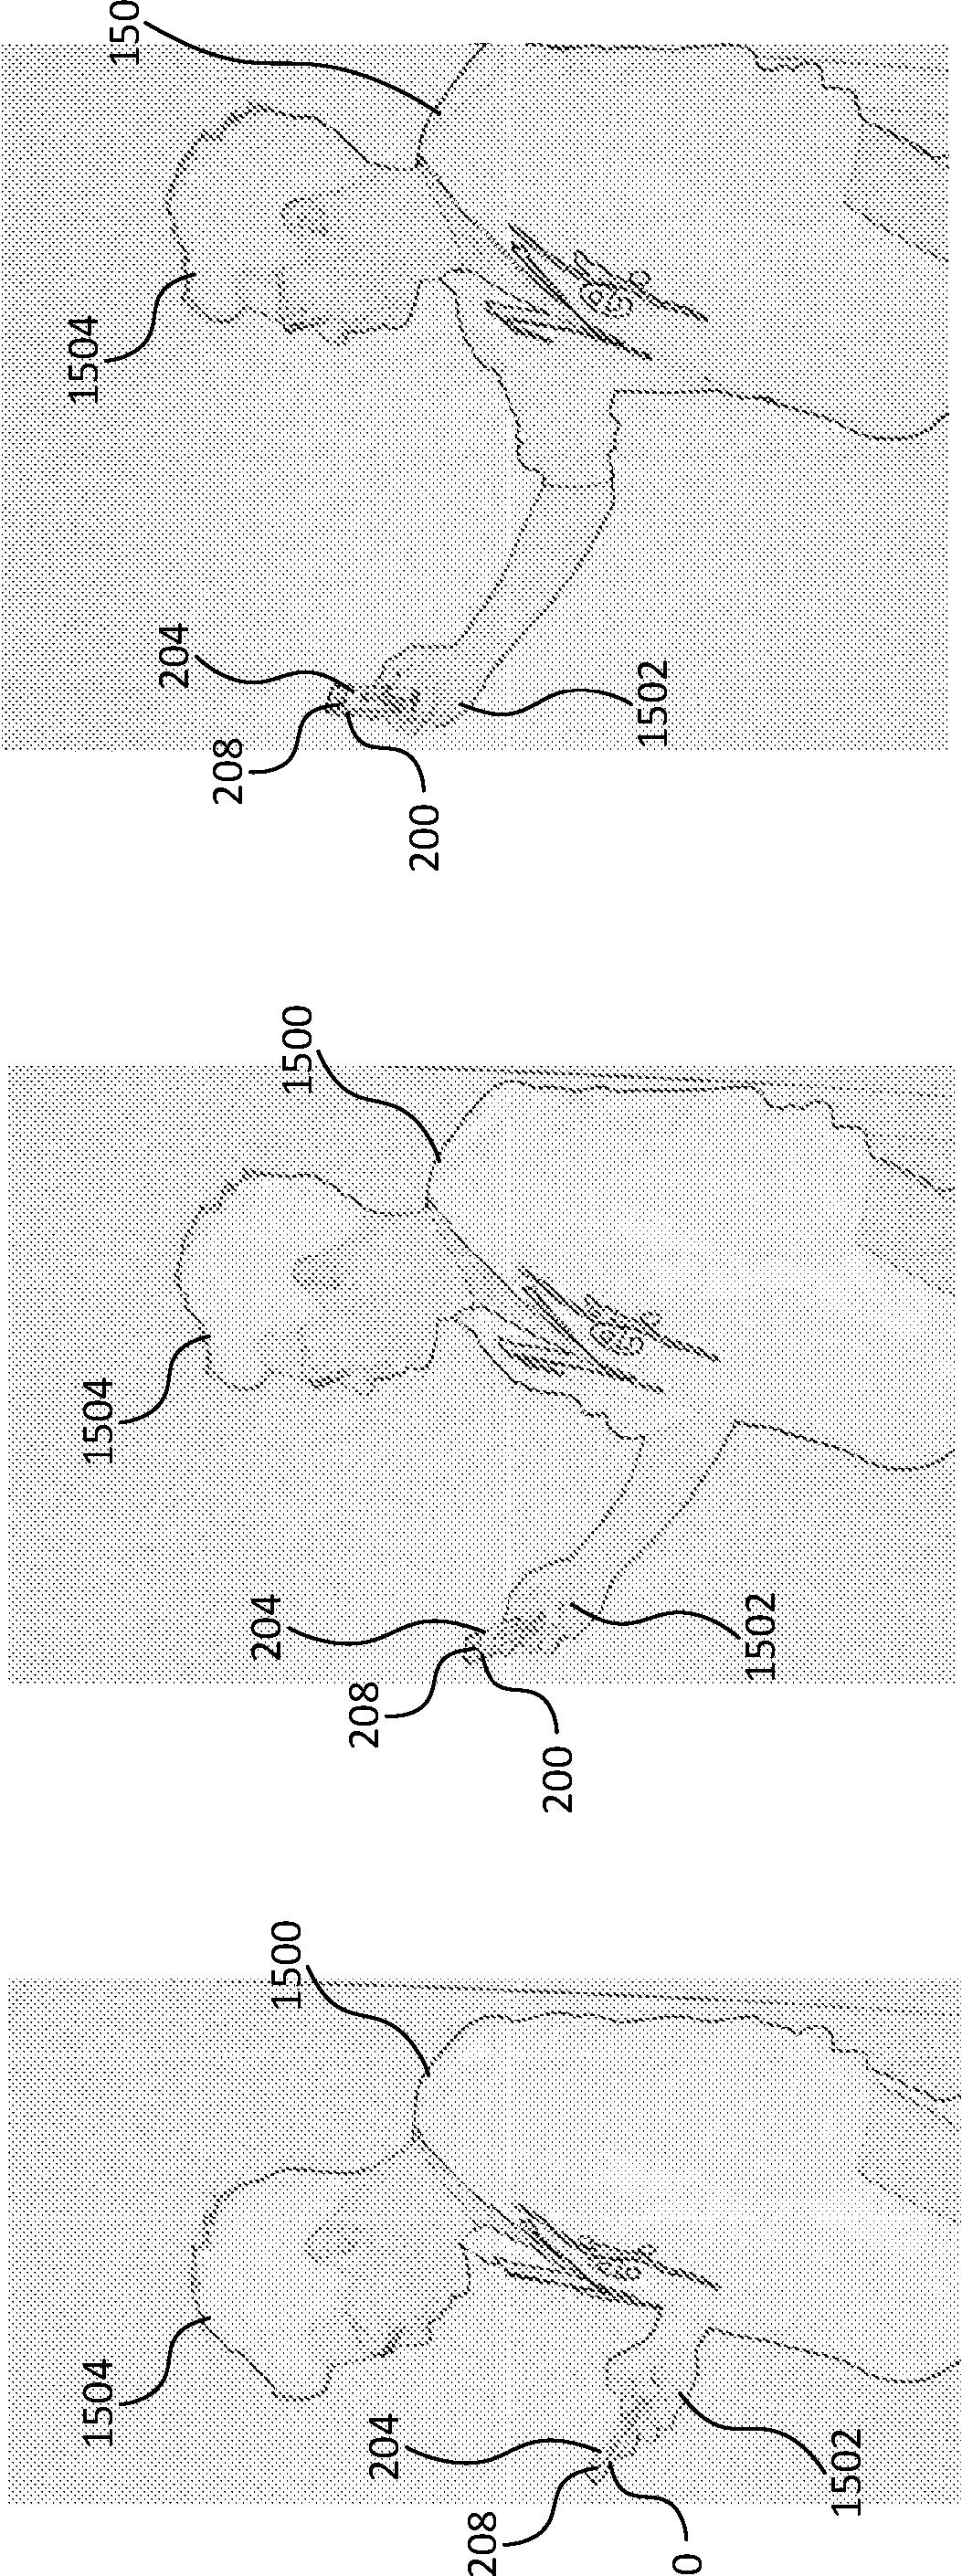 Figure GB2560340A_D0023